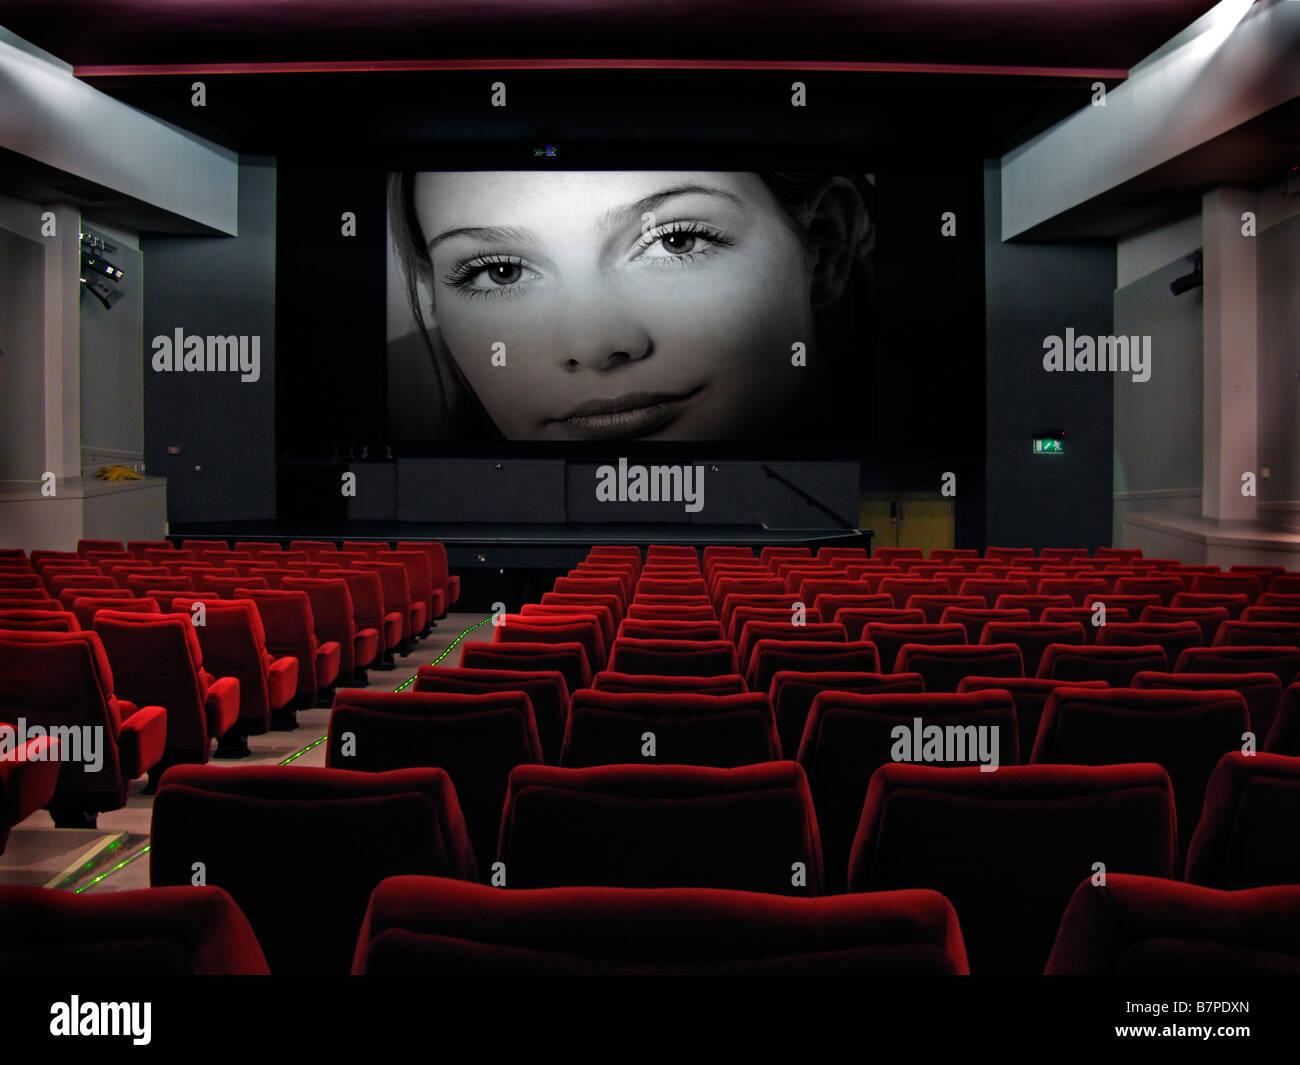 Kino mit dem Film auf dem Bildschirm Stockbild